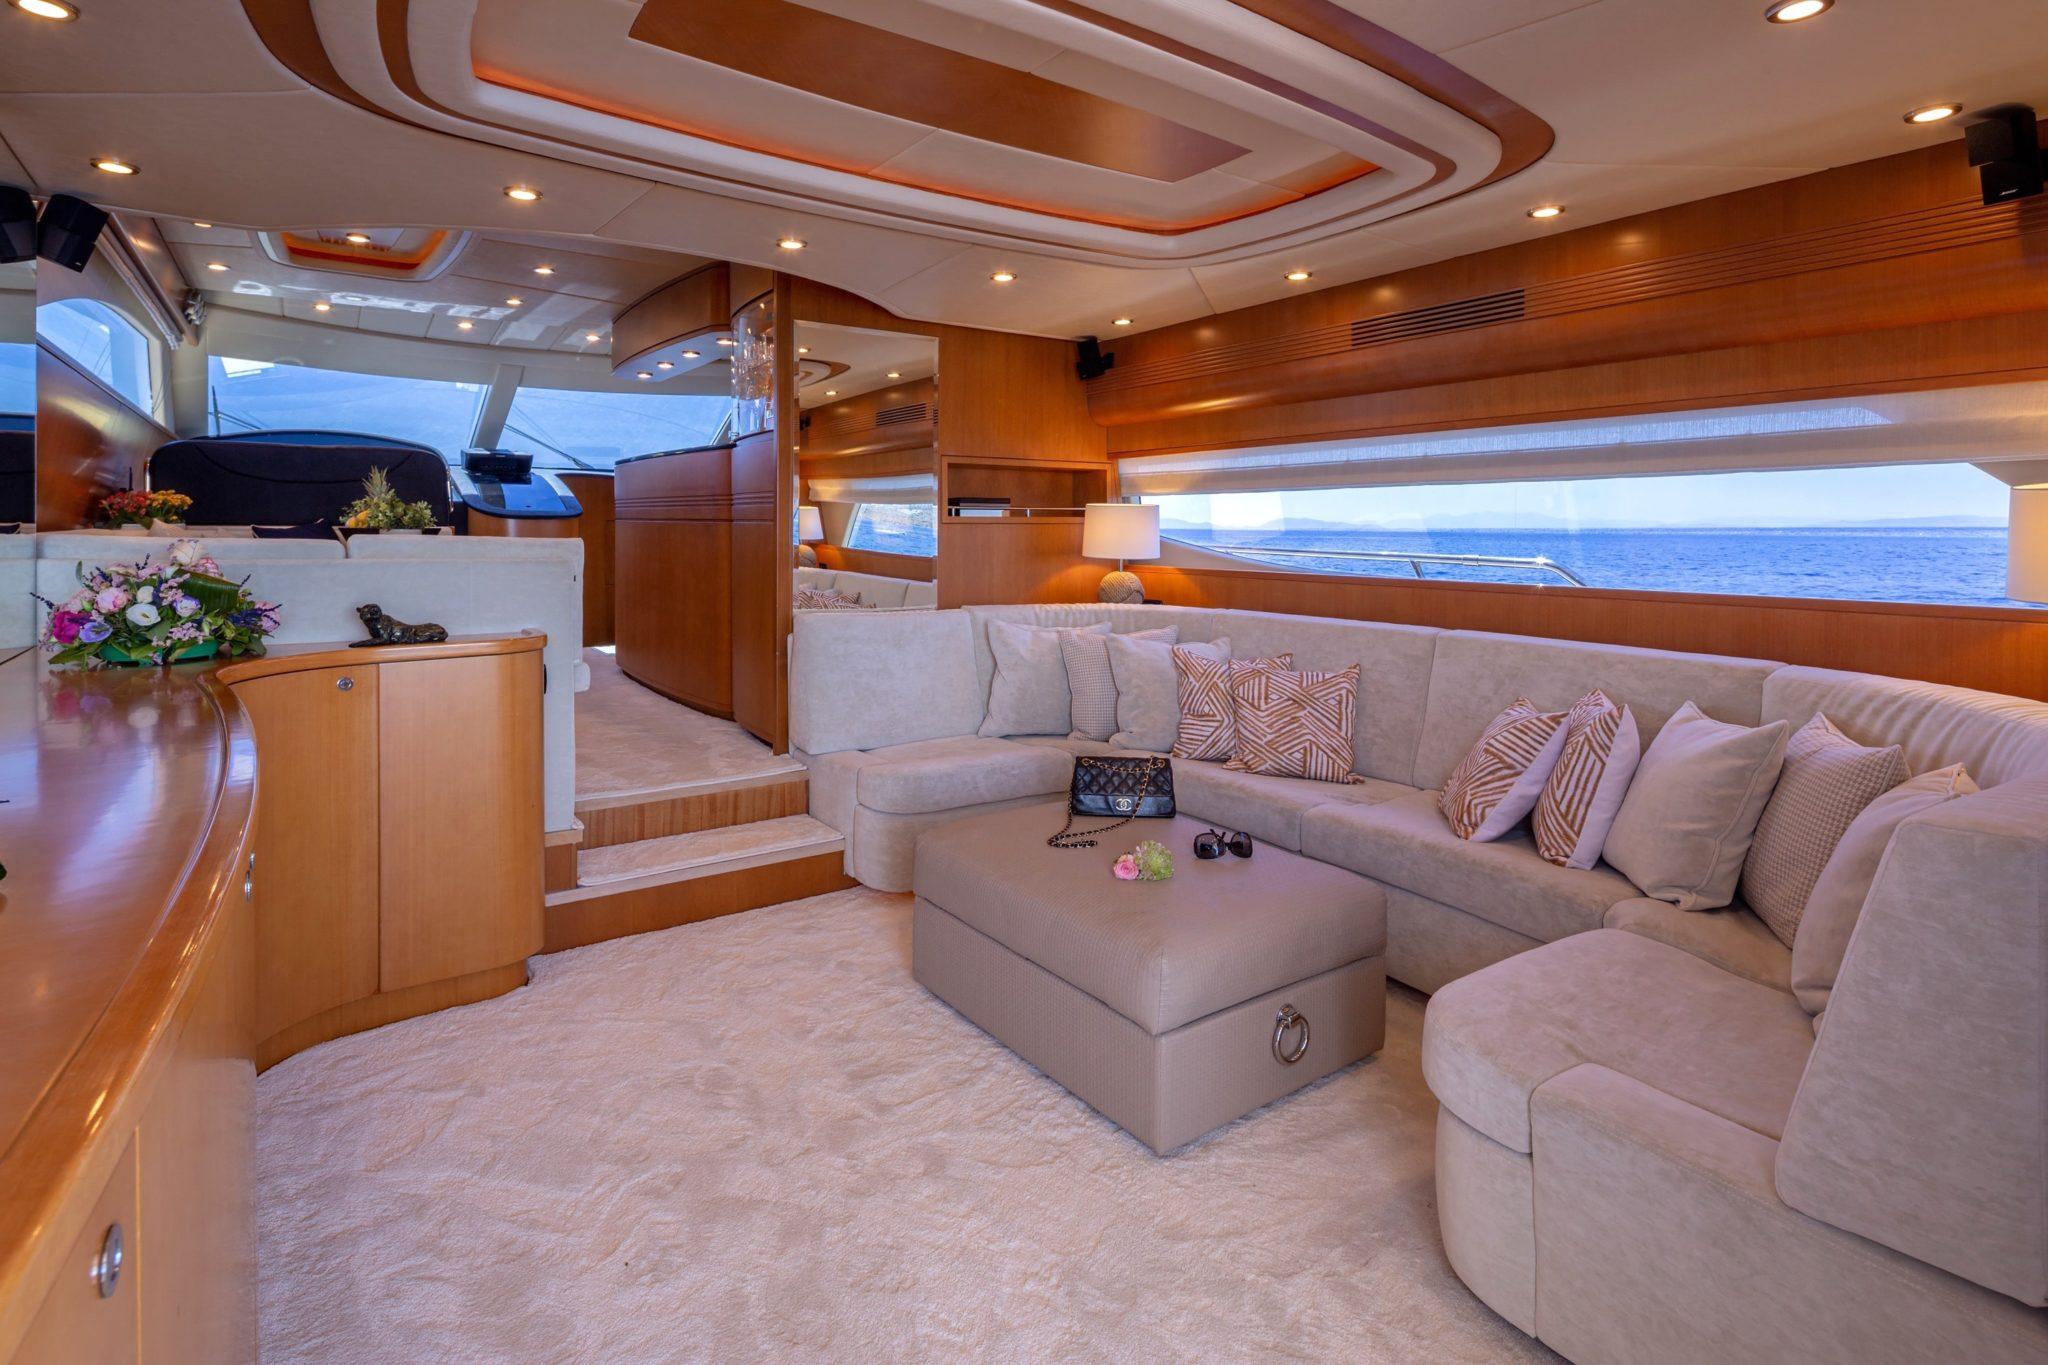 Legend Saloon min -  Valef Yachts Chartering - 0453